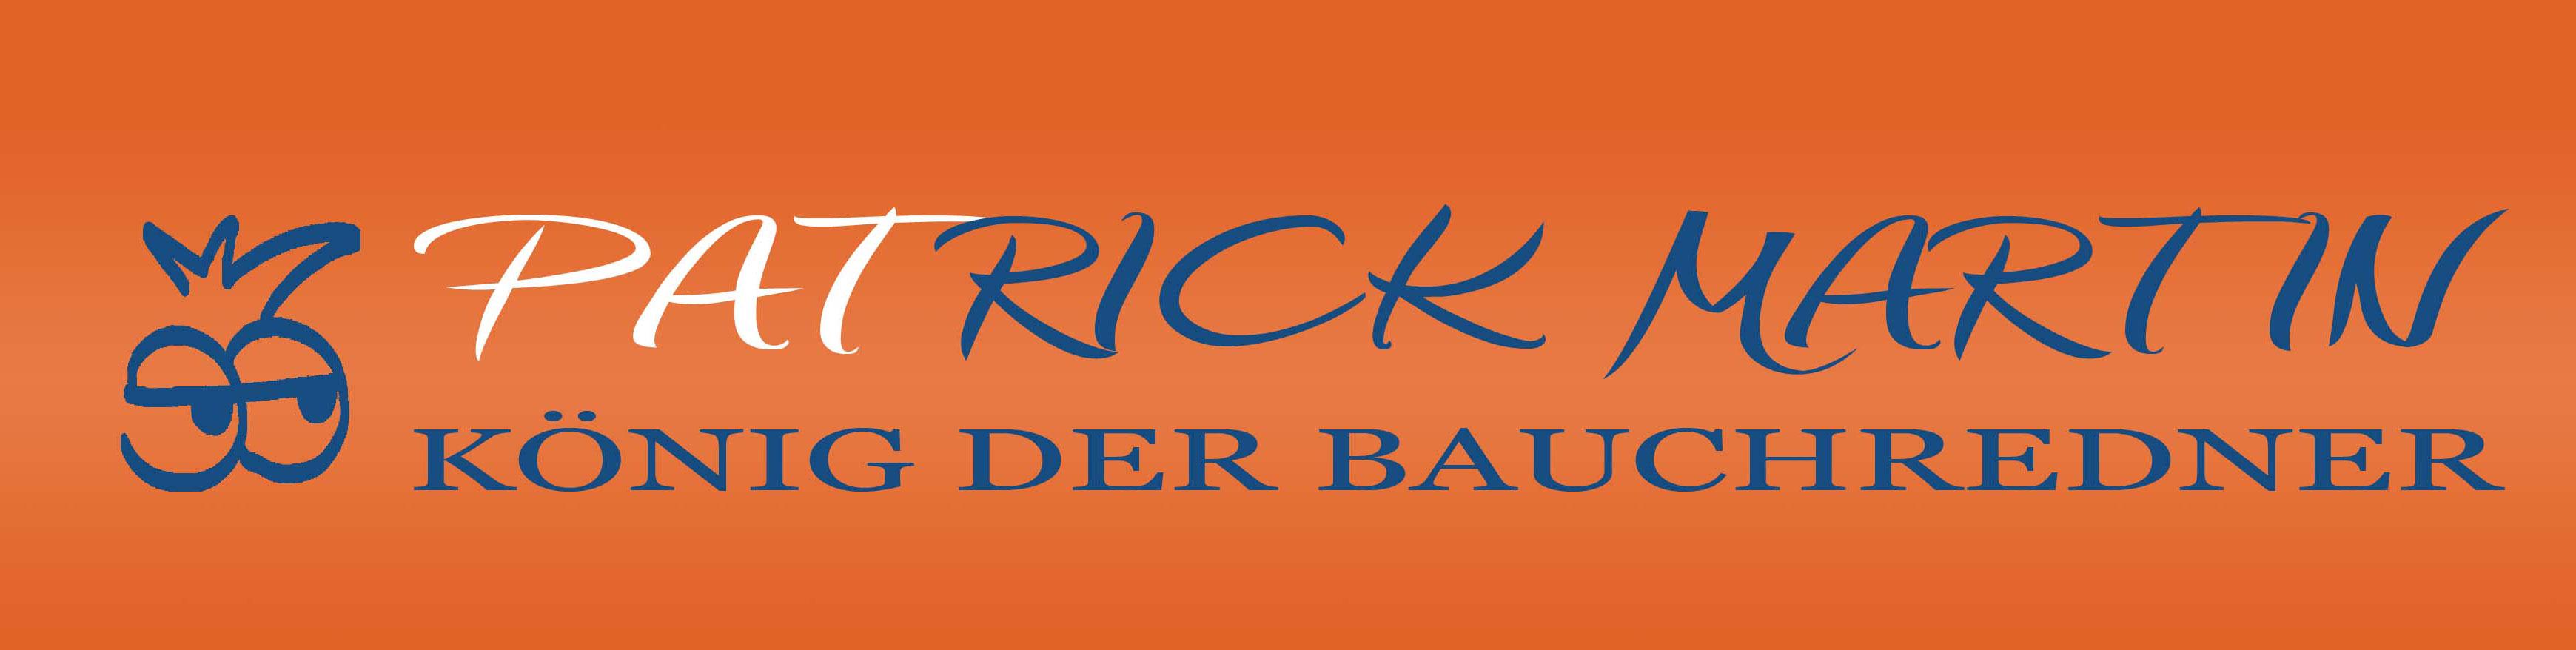 Bauchredner-pat